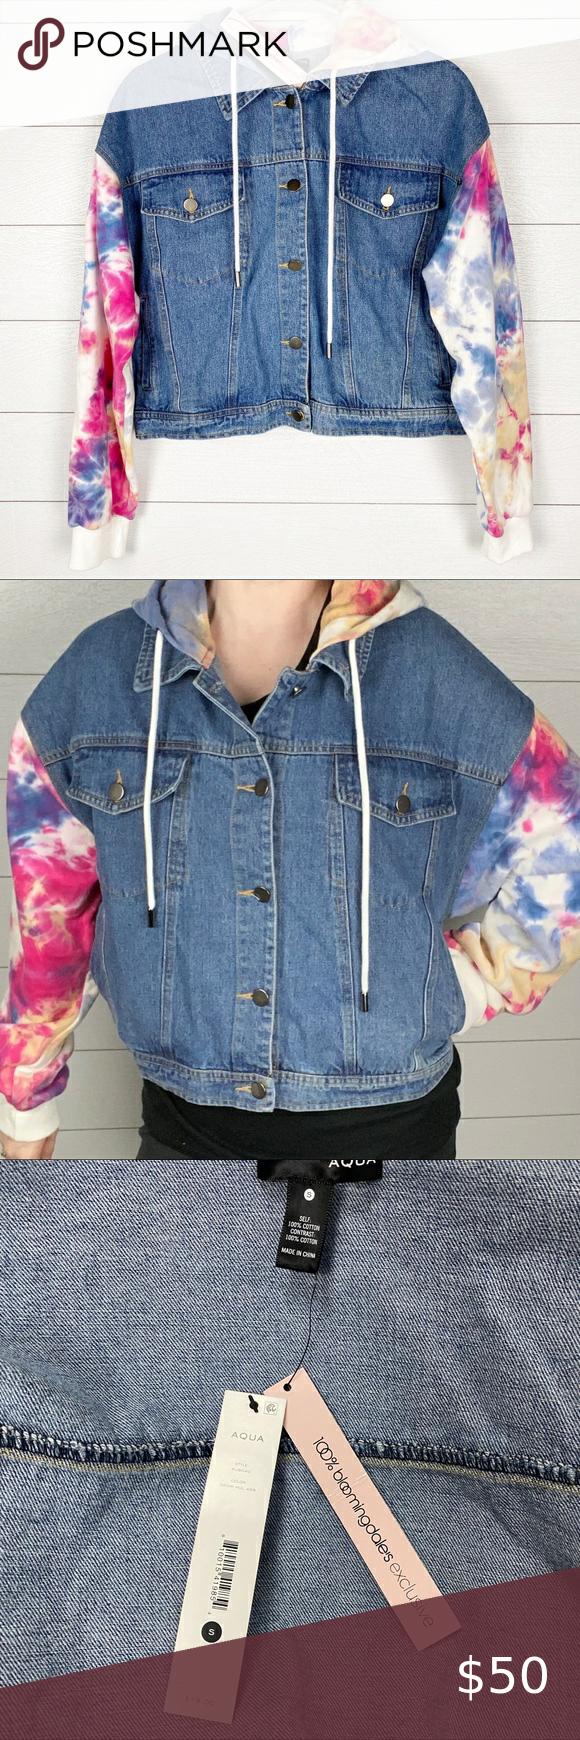 New Aqua Tie Dye Jean Sweatshirt Jacket New With Tags Nwt Aqua Bloomingdale S Exclusive Sweatshirt Jean Ja Tie Dye Jeans Jean Jacket Hoodie Hooded Denim Jacket [ 1740 x 580 Pixel ]